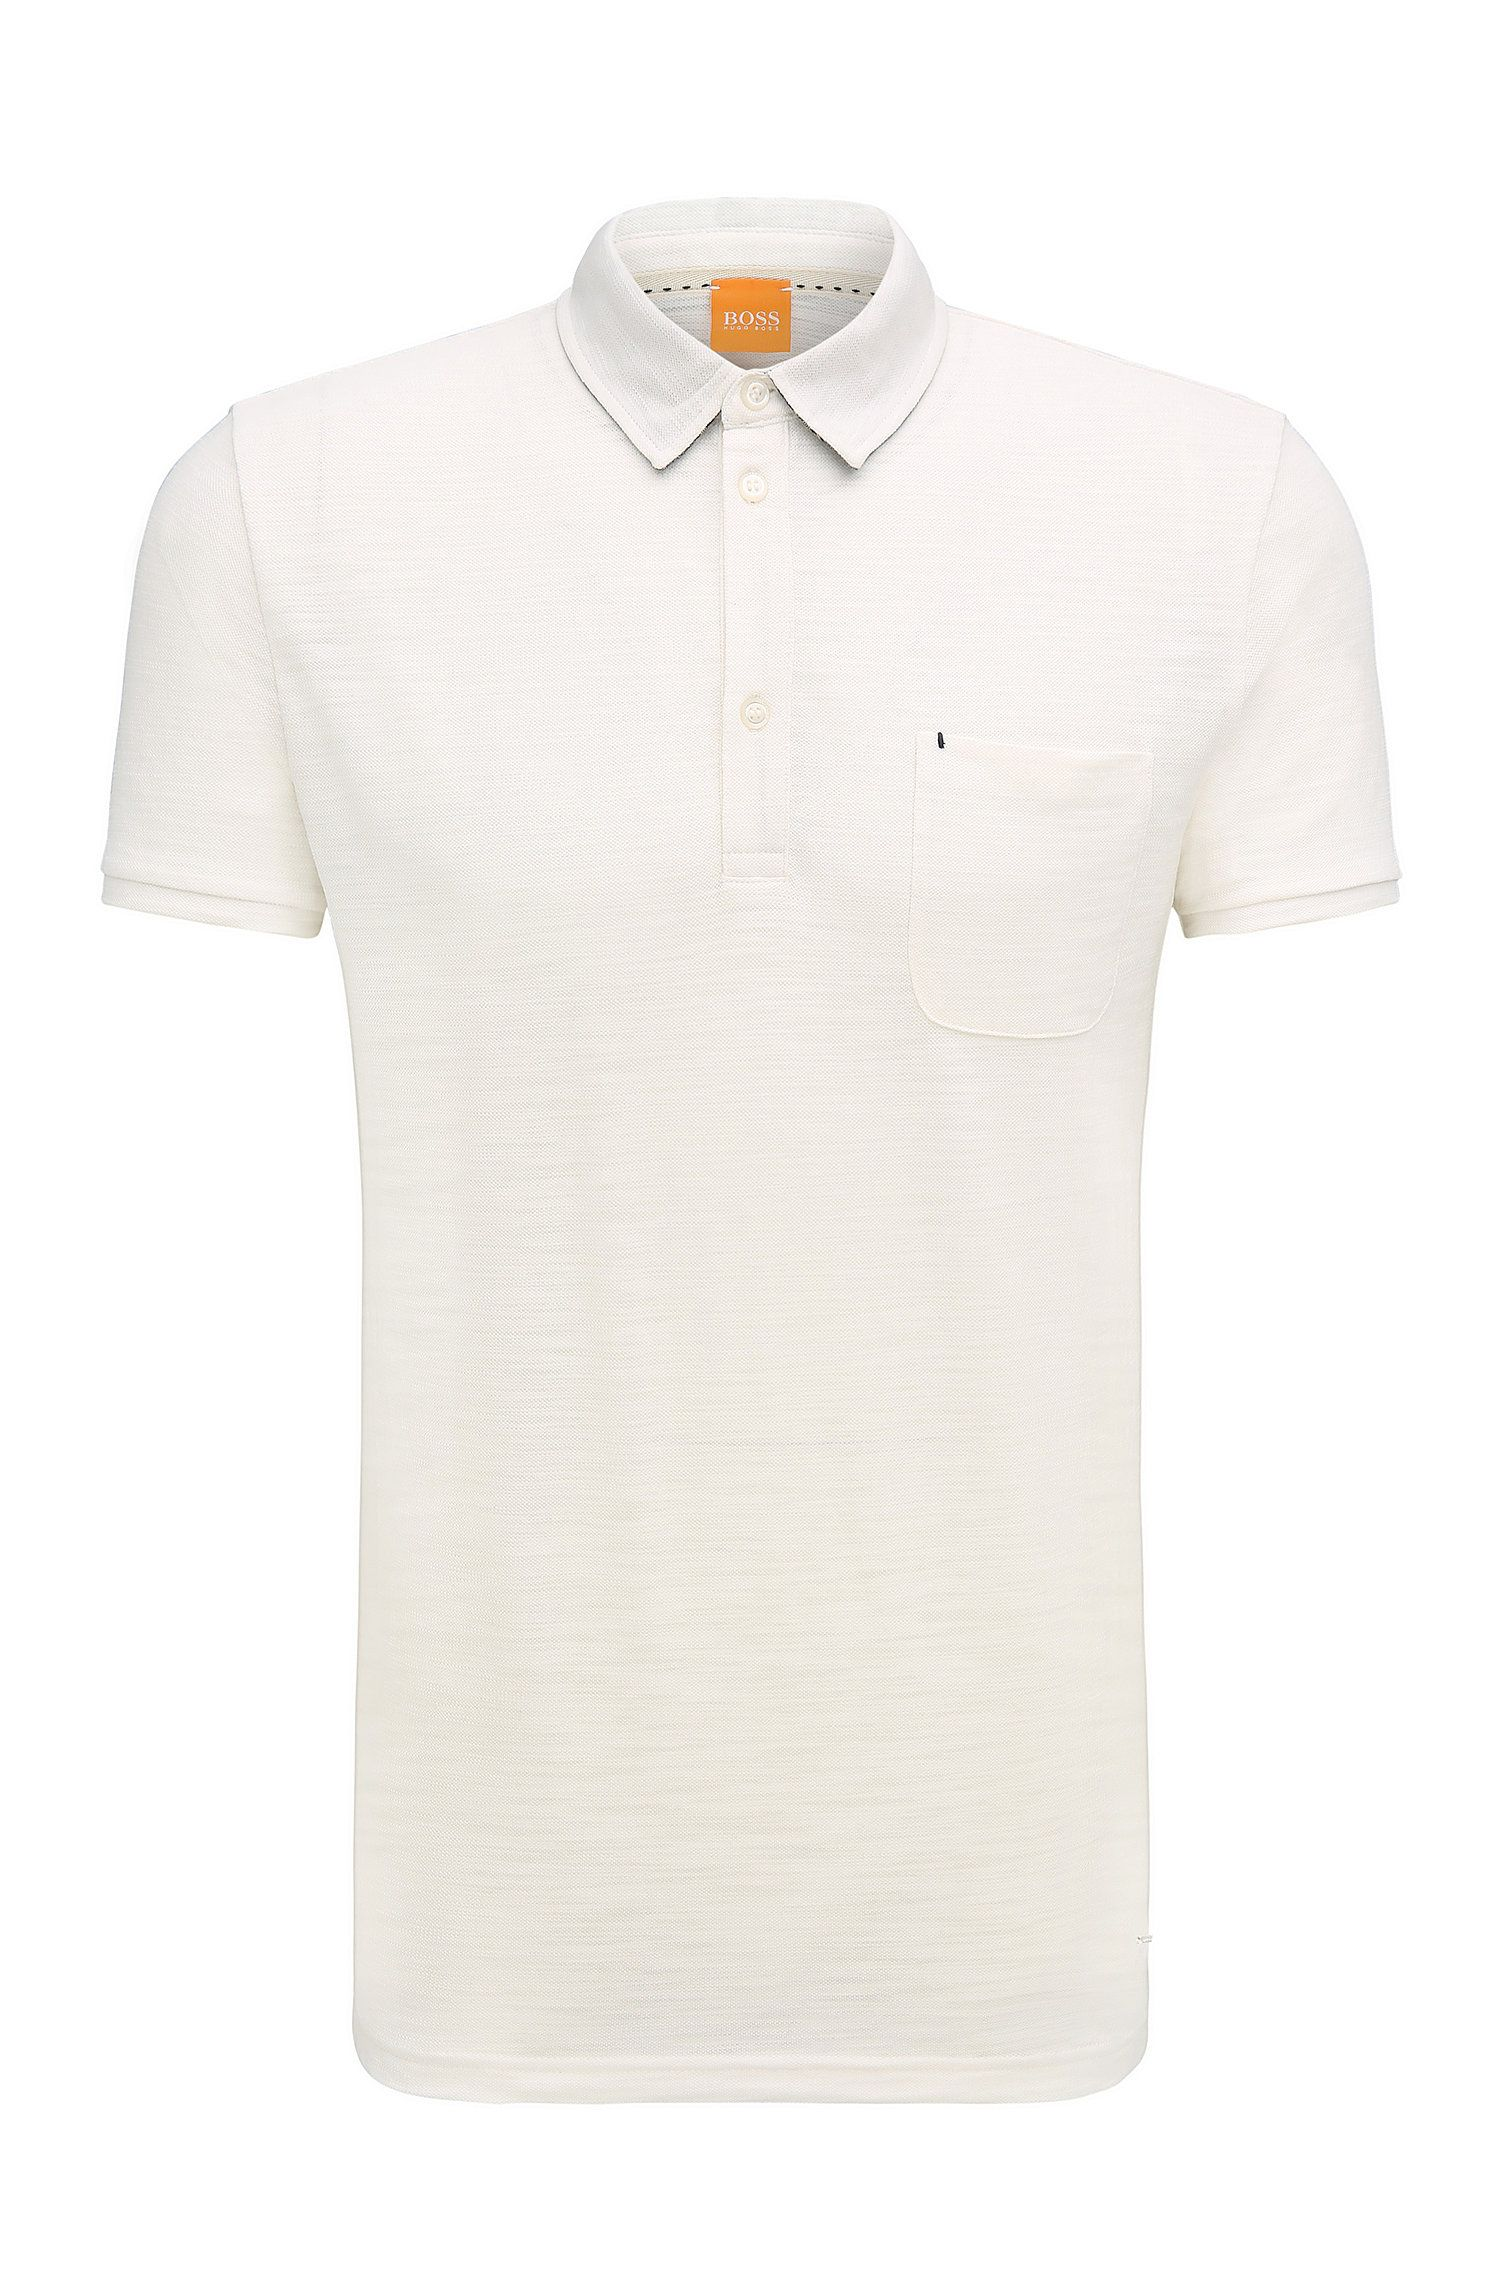 Relaxed-Fit Poloshirt aus Baumwoll-Mix mit Struktur